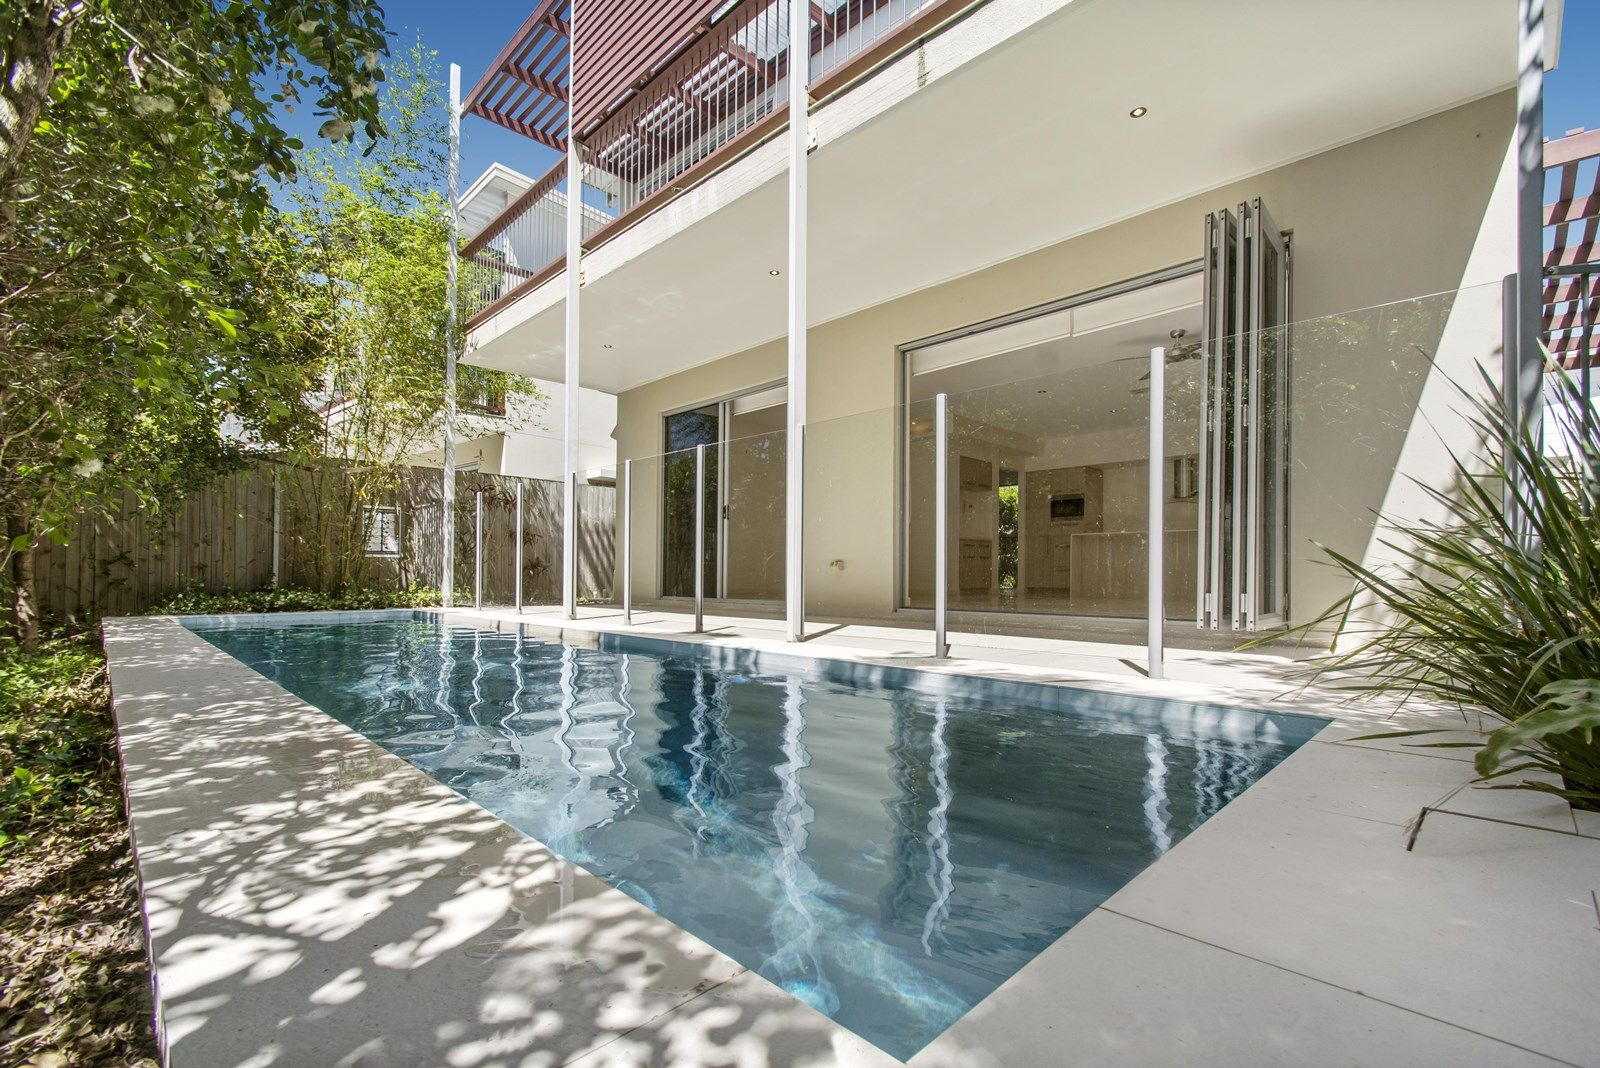 5/21 Hilton Terrace, Tewantin QLD 4565, Image 2